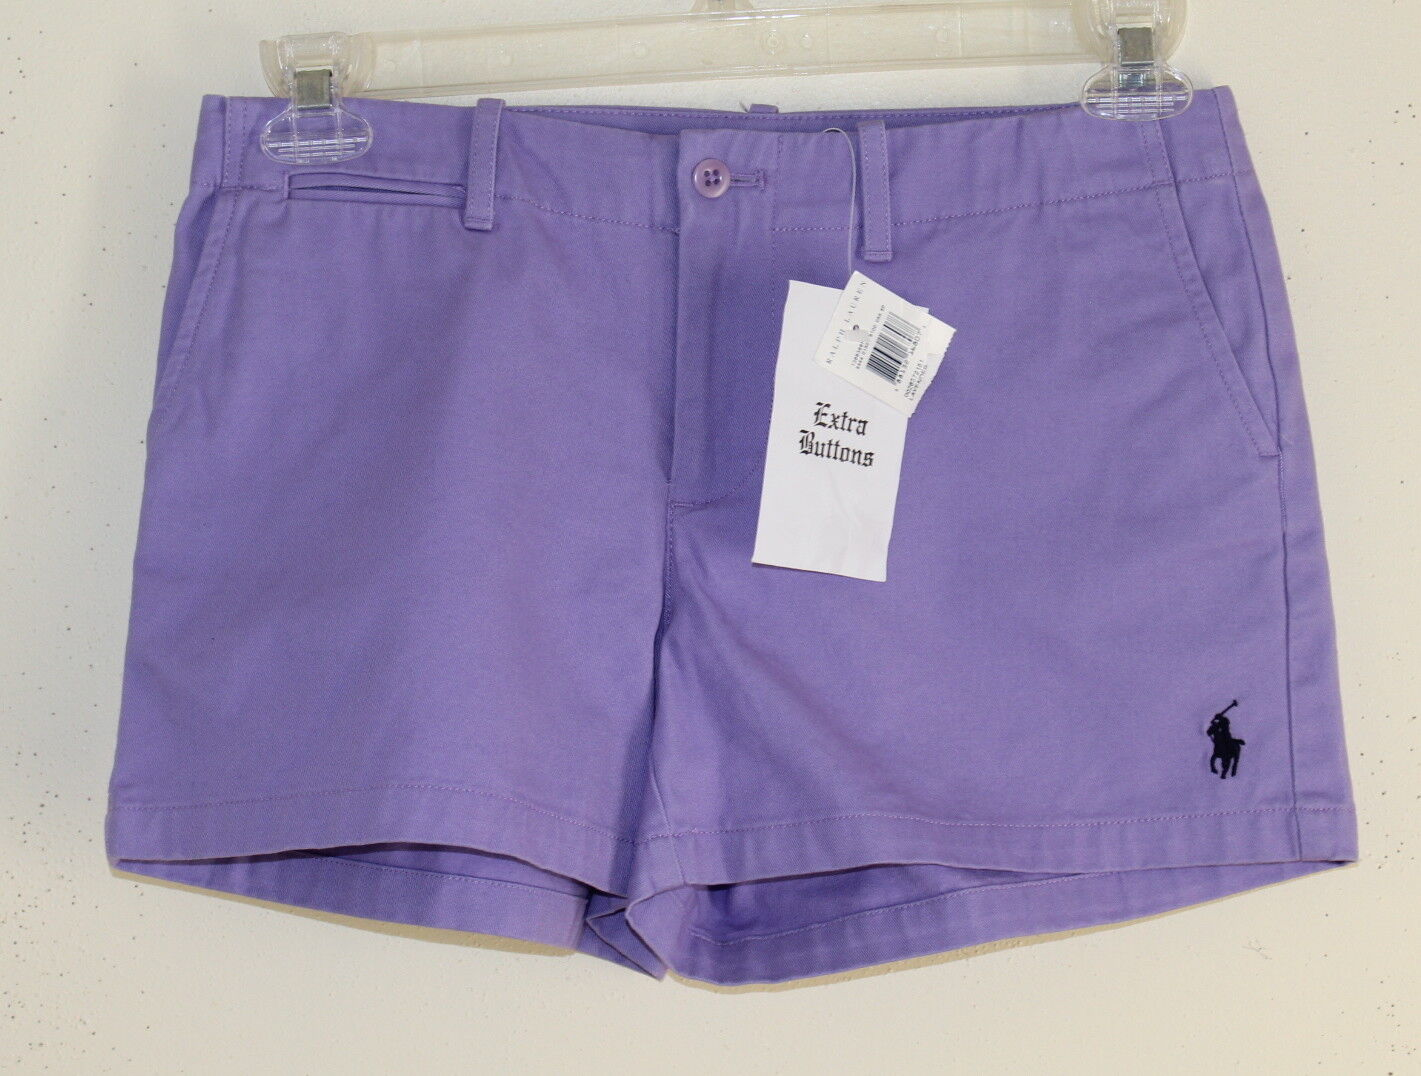 NWT Ralph Lauren Sport- Sz 4 Preppy Lavender Purple Cotton Twill Shorts Womens